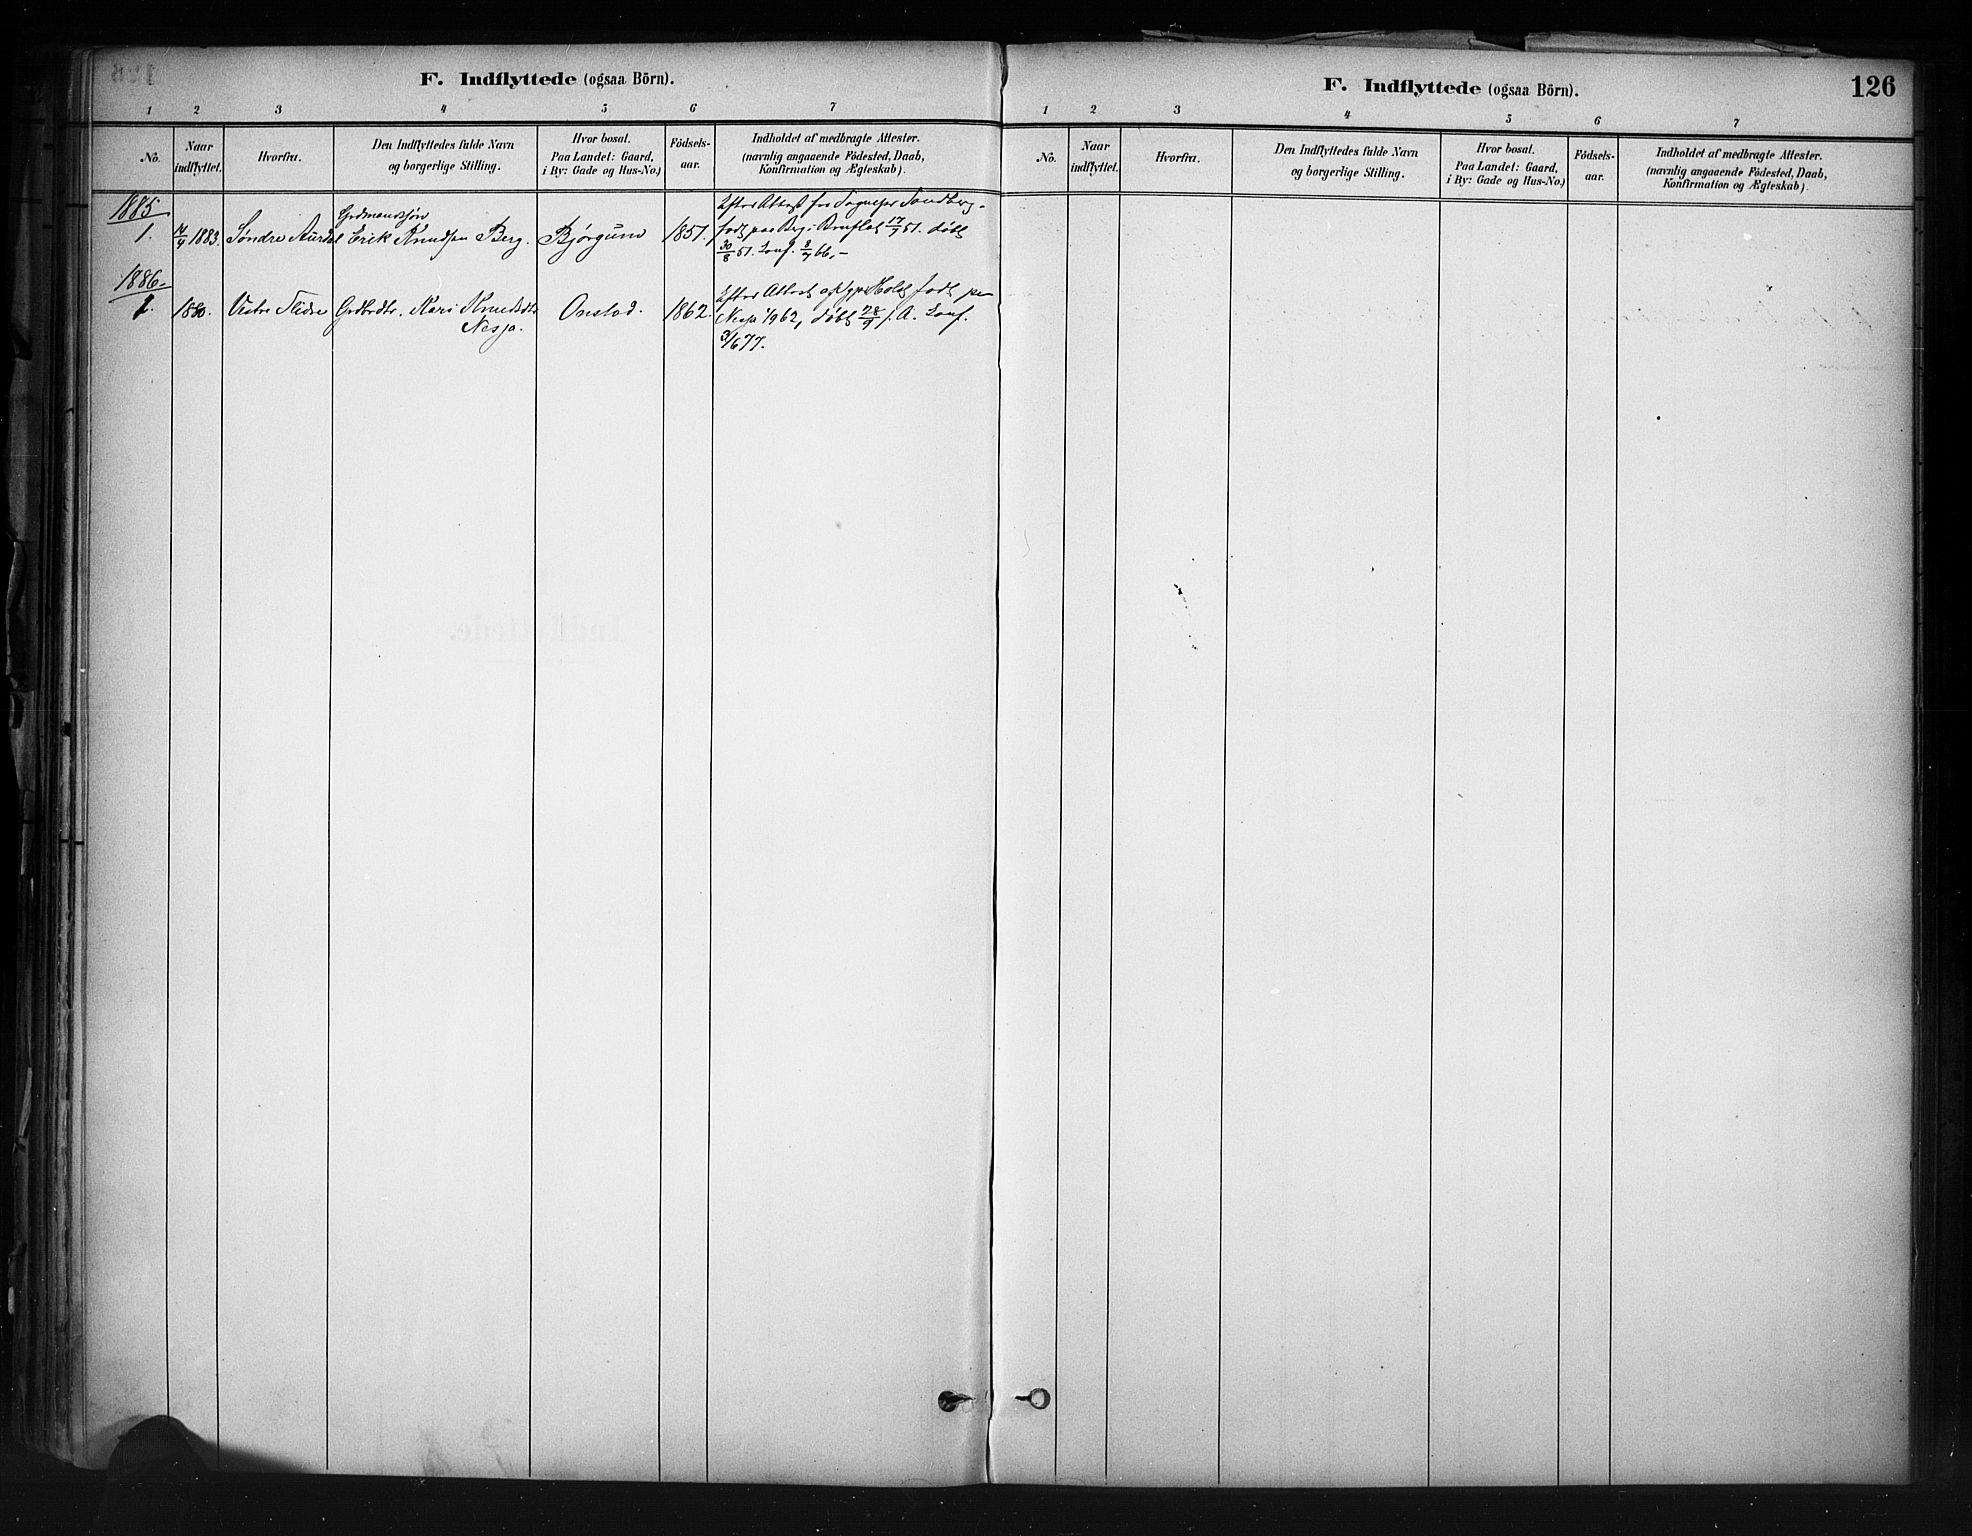 SAH, Nord-Aurdal prestekontor, Ministerialbok nr. 13, 1883-1895, s. 126